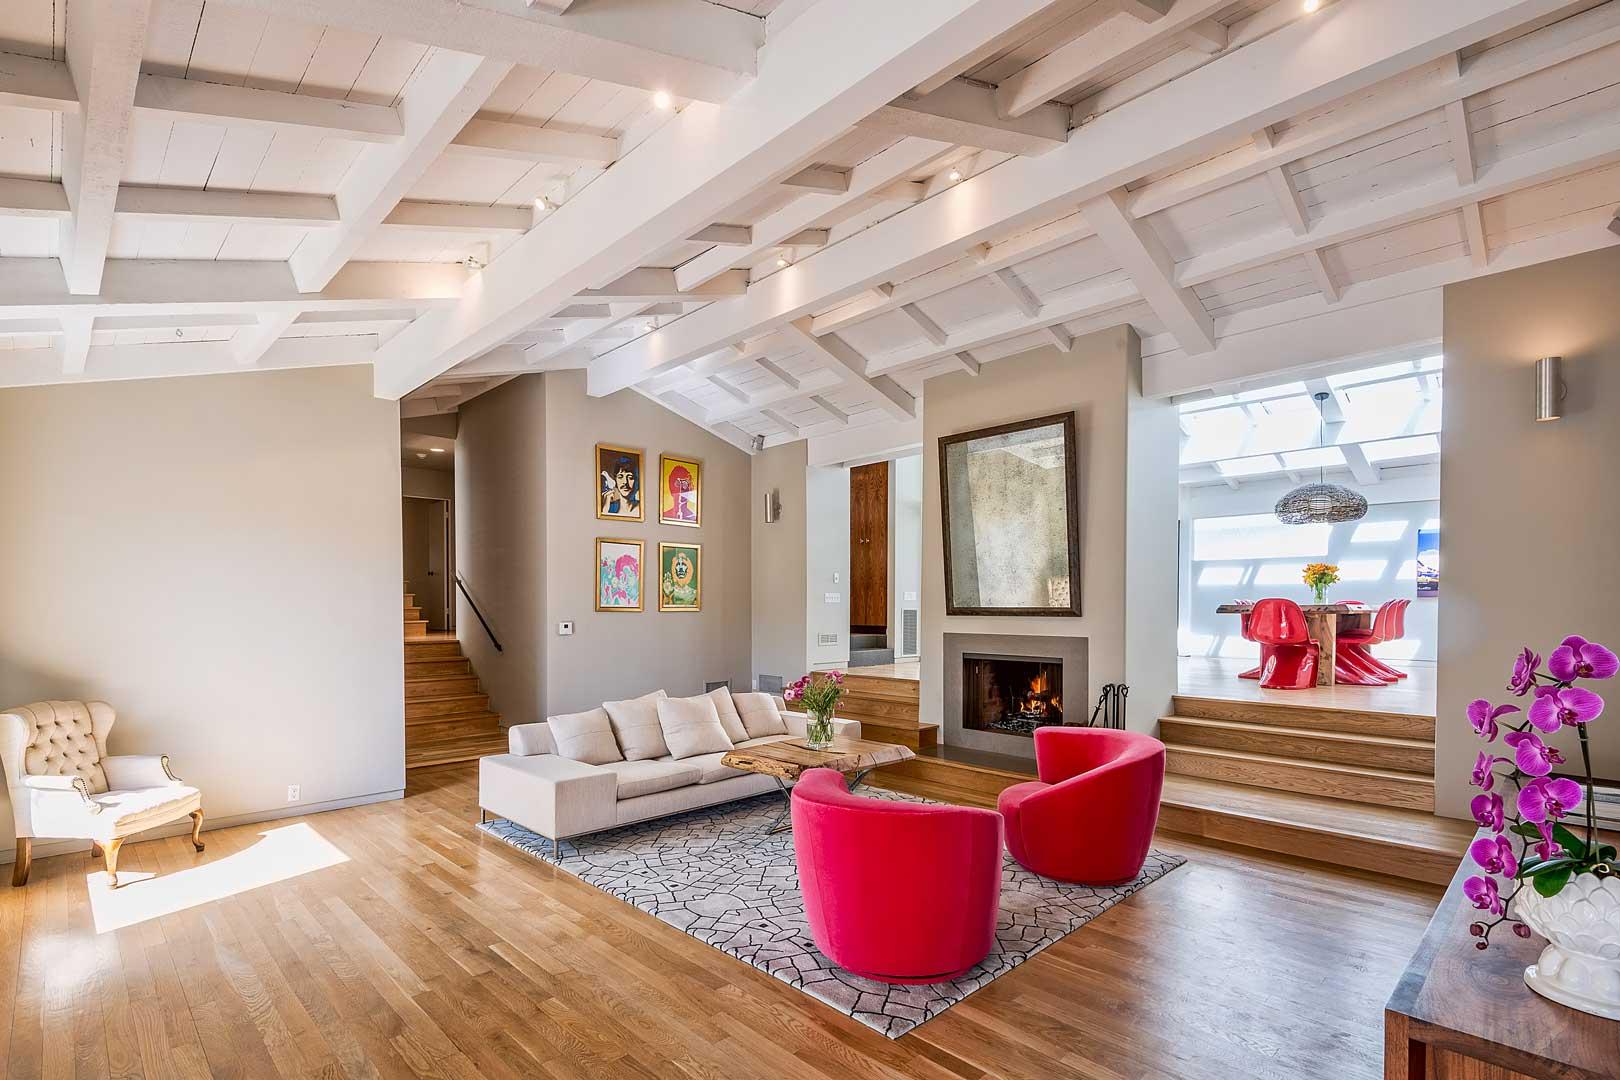 Los Angeles - Hillside Abode